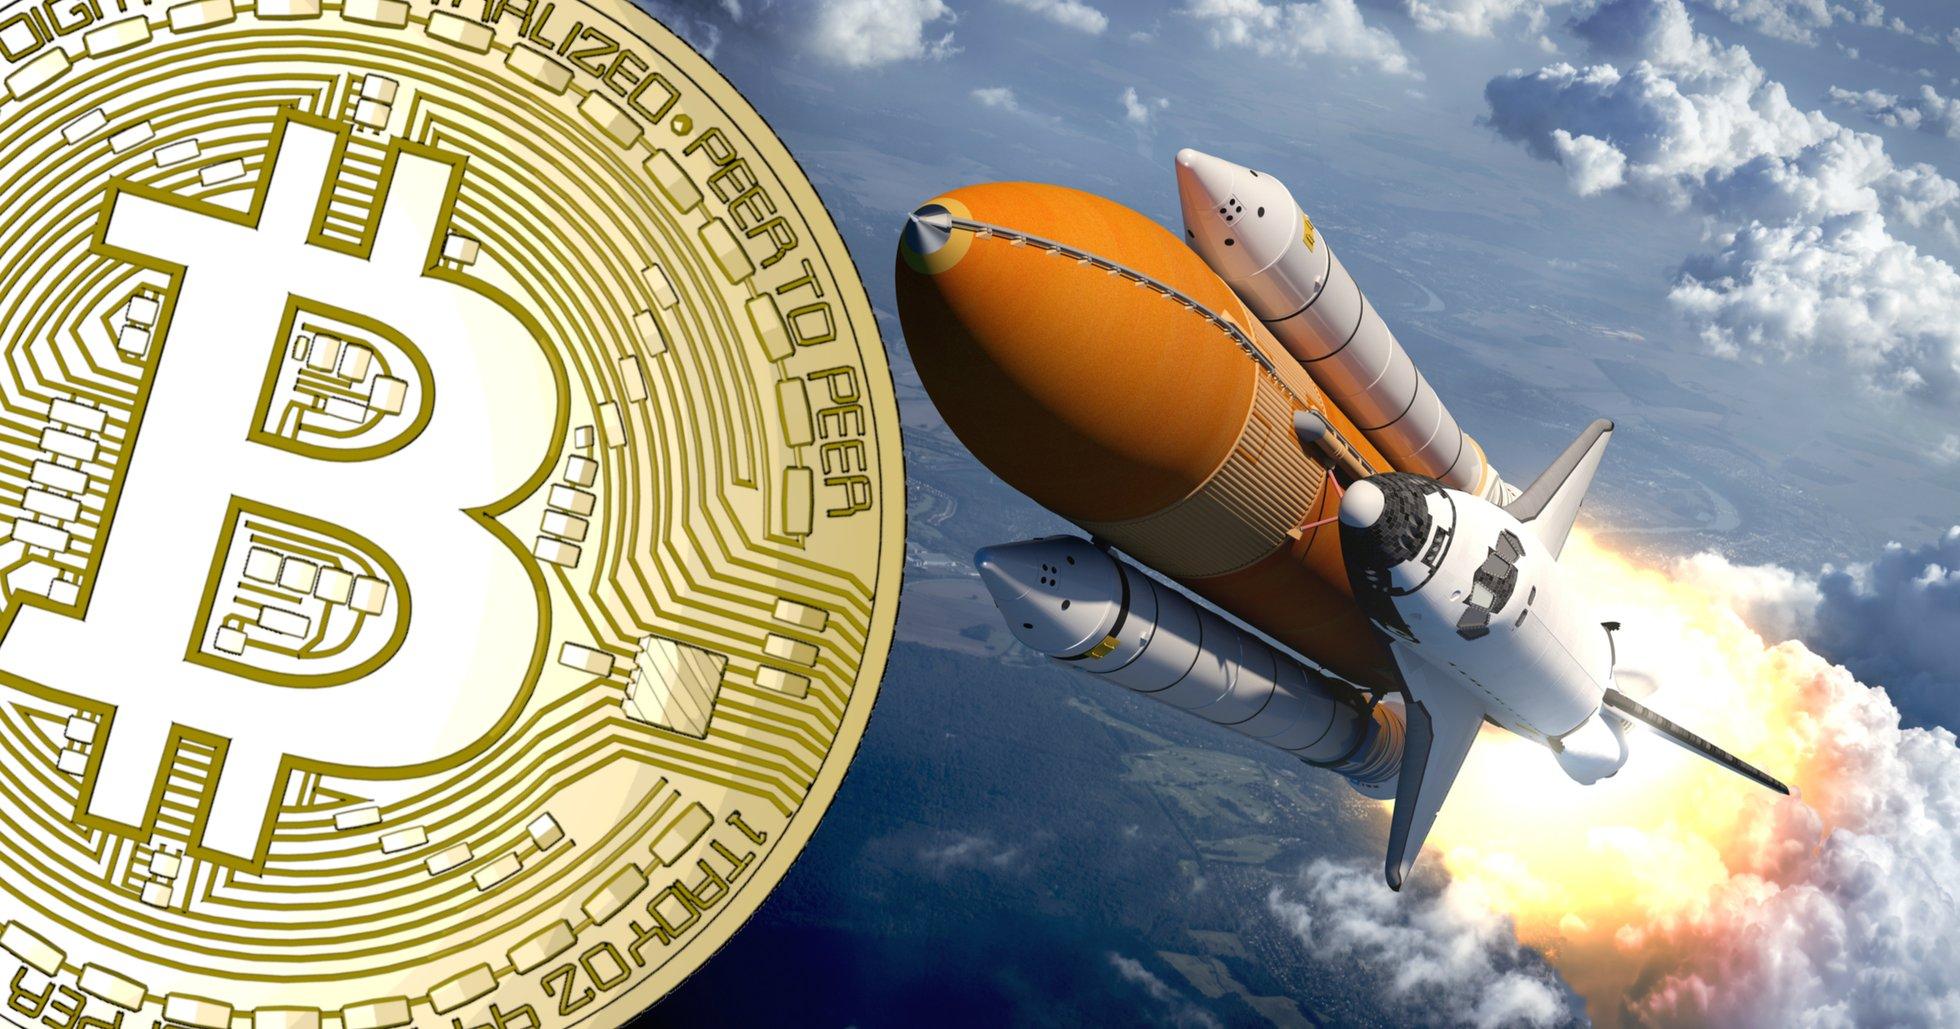 Bitcoinpriset rusar mot 13 000 dollar – har ökat 13 procent senaste dygnet.